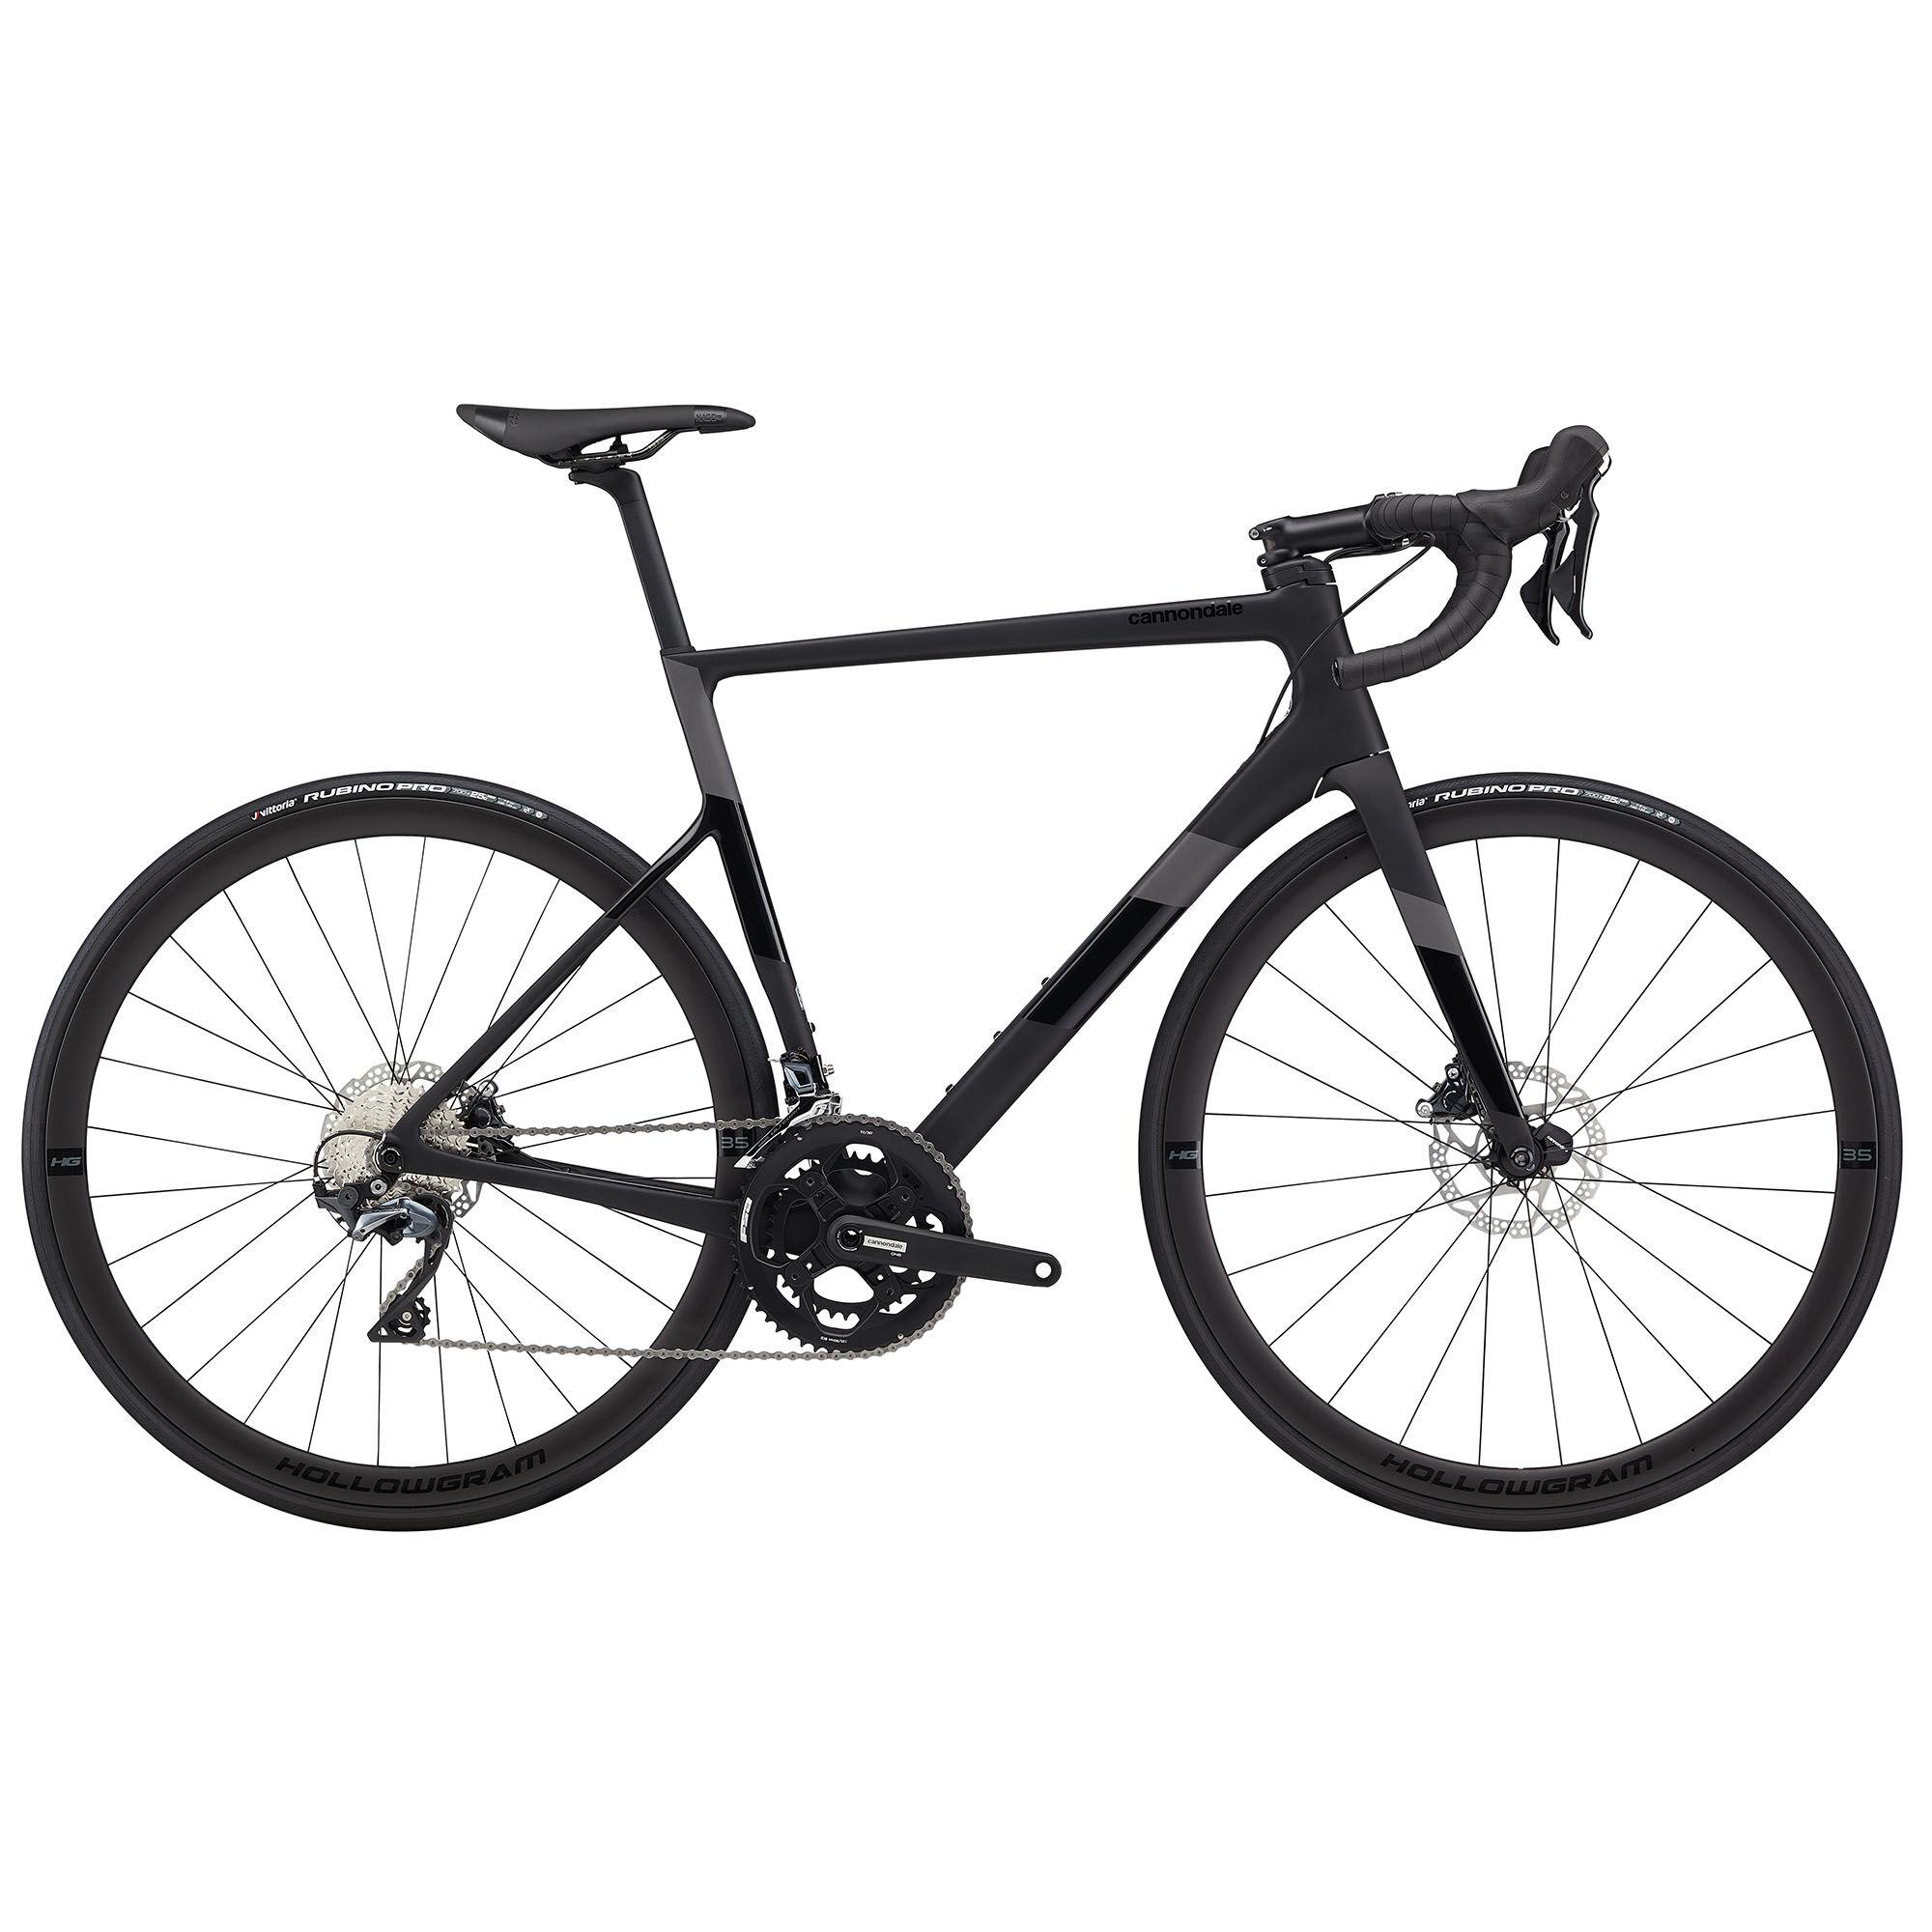 Cannondale Men's SuperSix EVO Carbon Disc Ultegra Performance Road Bike '20  - Matte Black - Size: 56